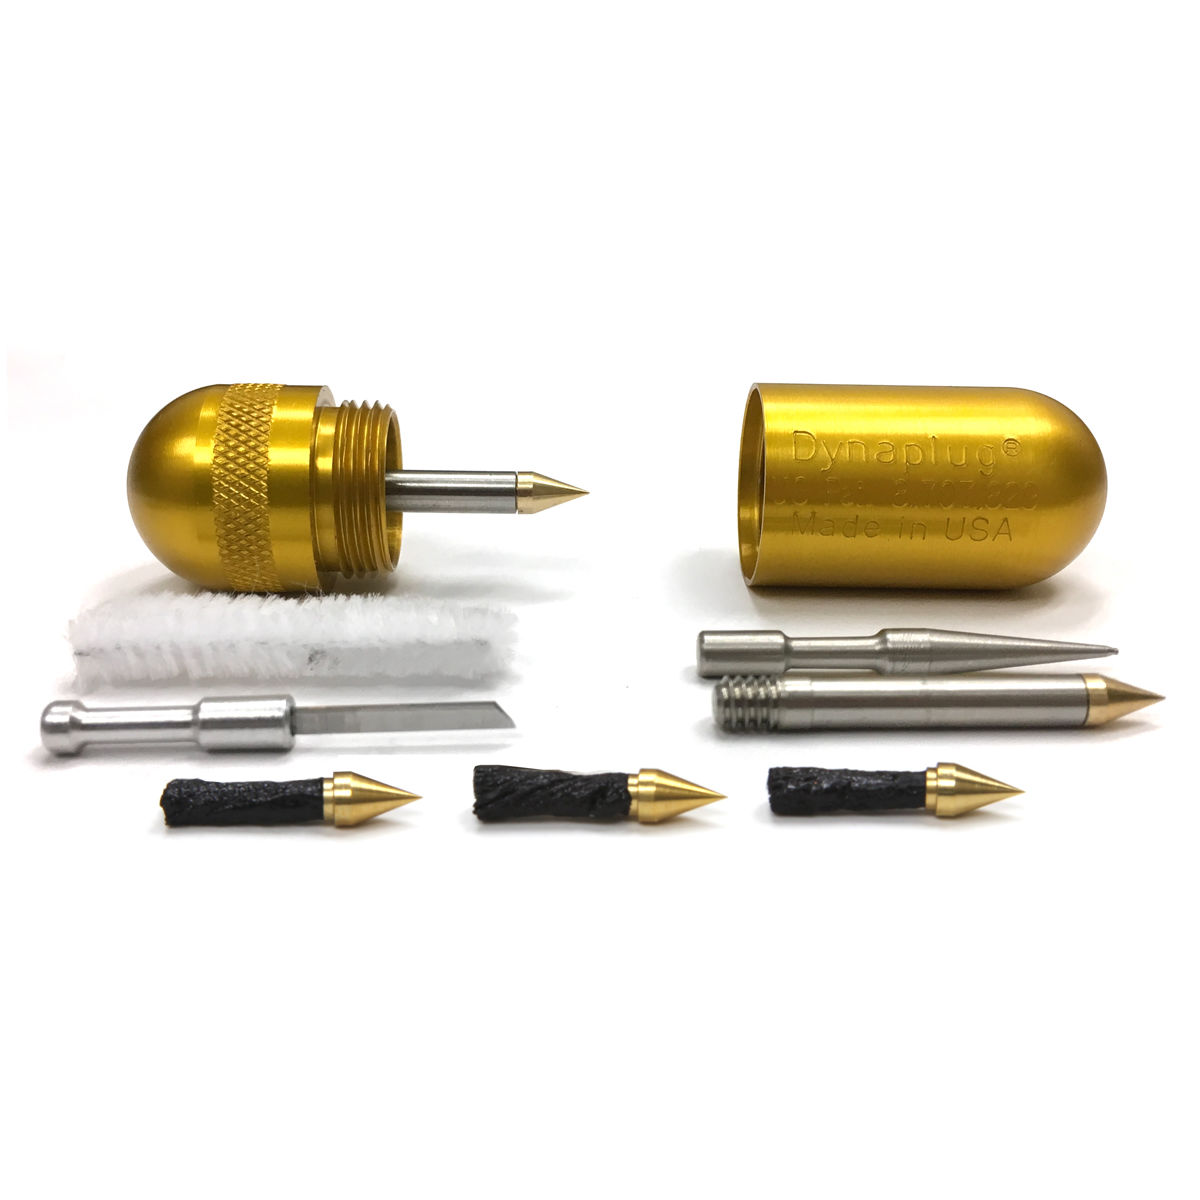 Dynaplug Micro Pro Kit Zlatá